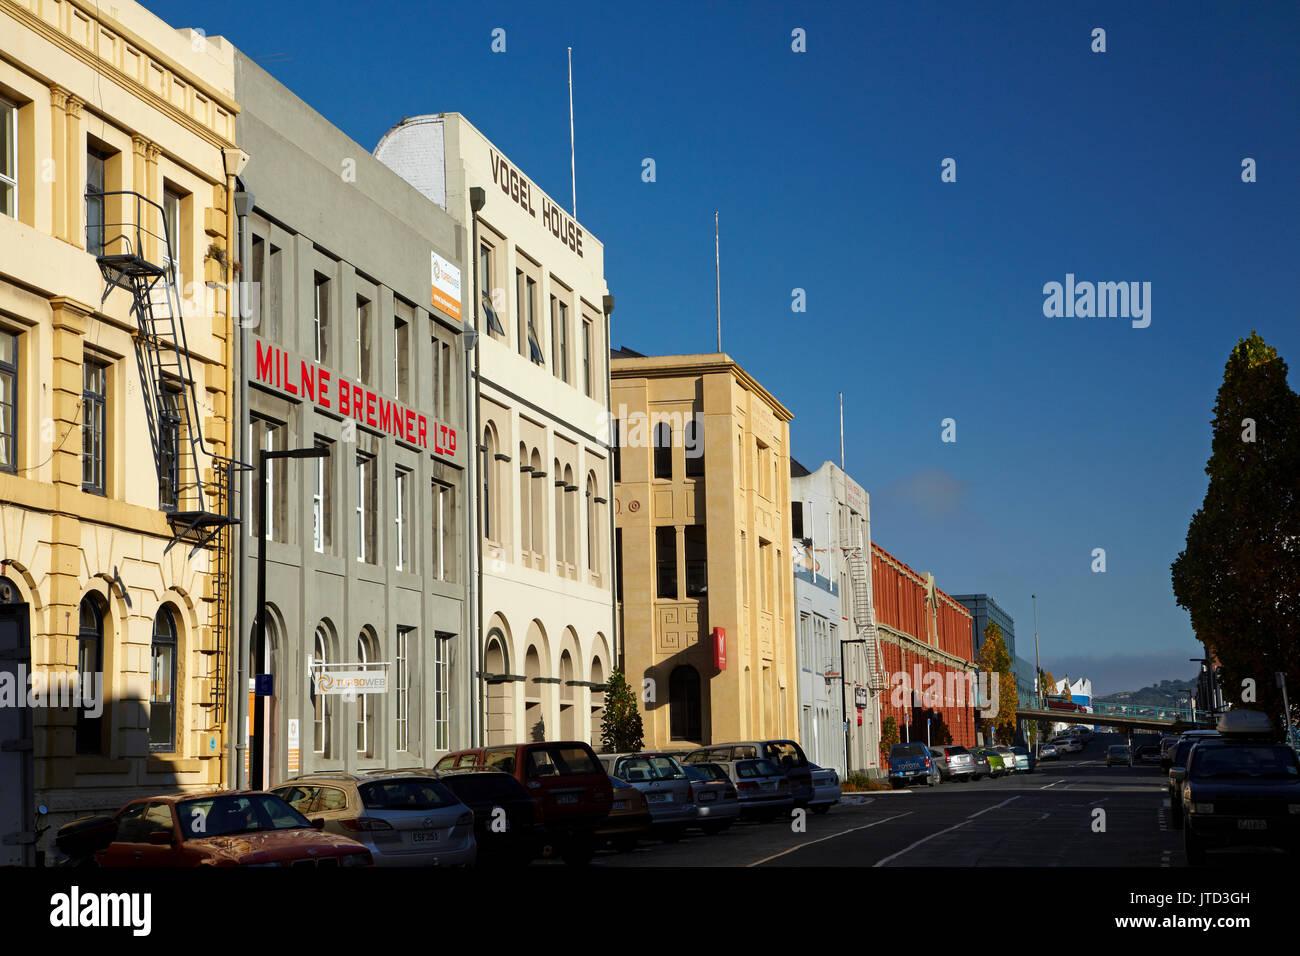 Historic buildings, Vogel Street, Dunedin, South Island, New Zealand - Stock Image